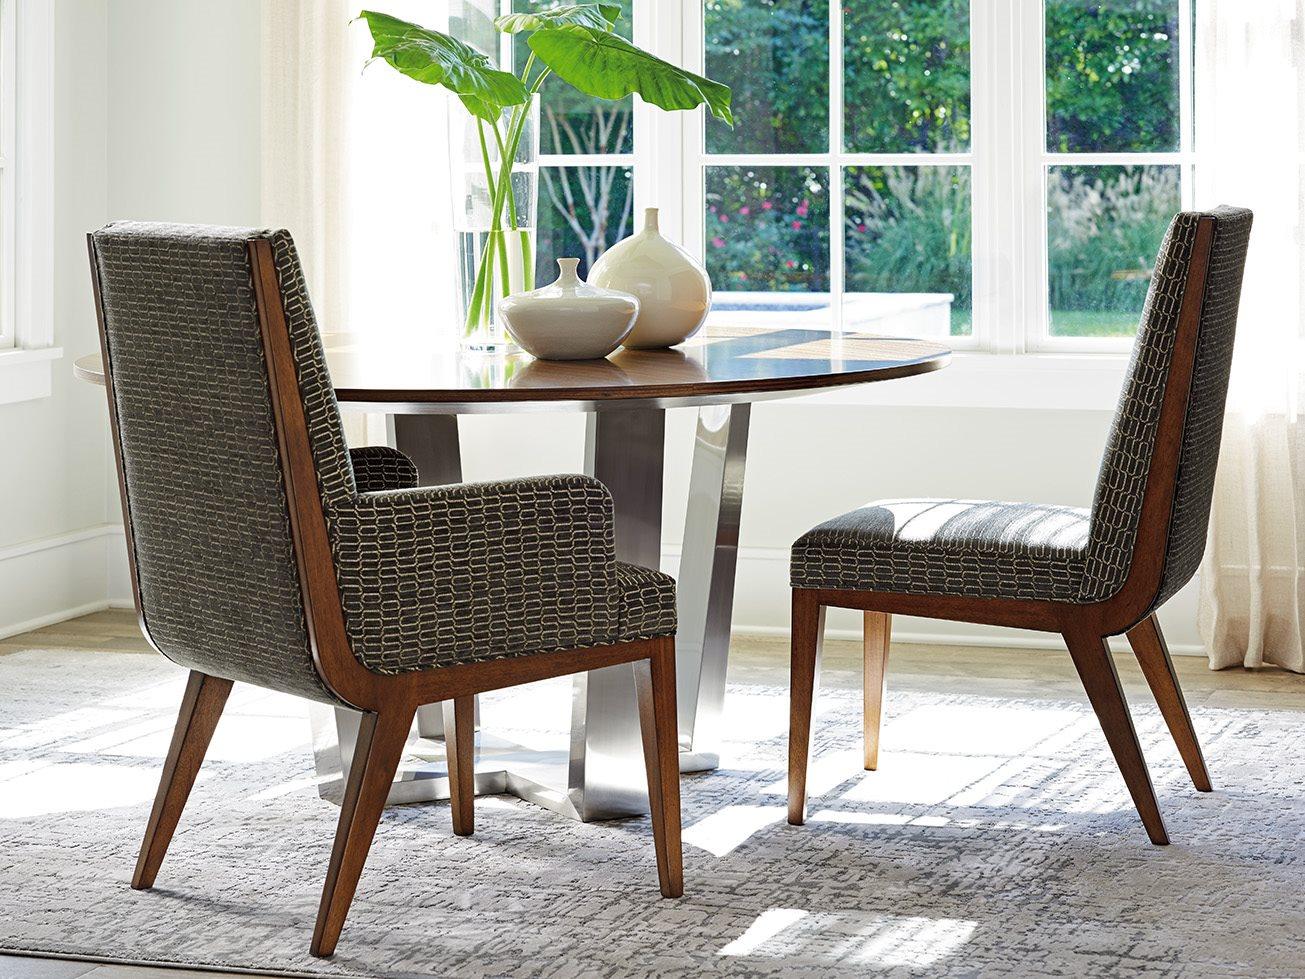 lexington dining room | Lexington Kitano Dining Room Set | LX734875CSET3